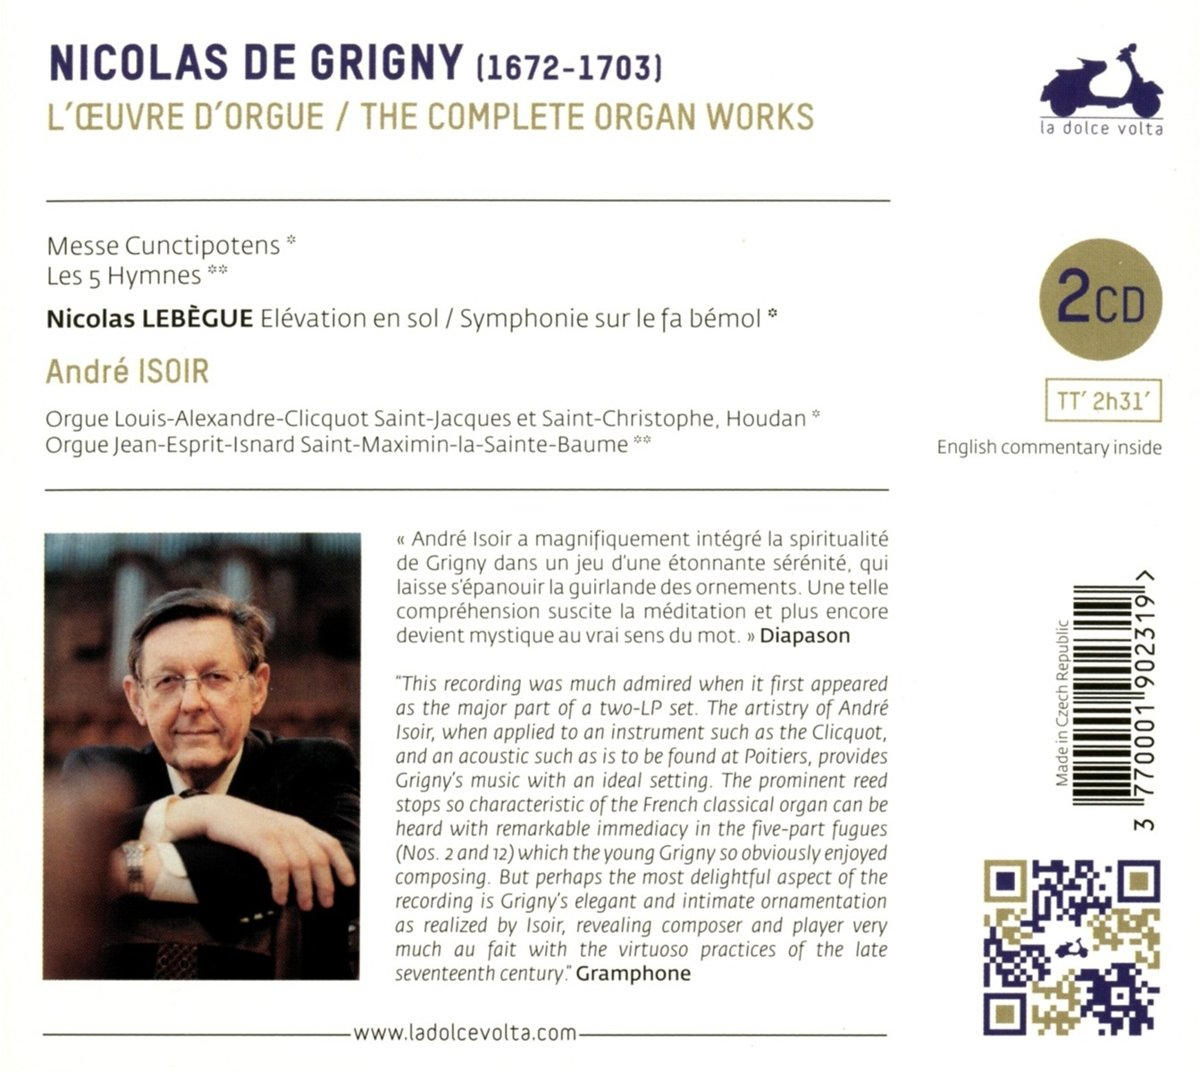 Nicolas de Grigny (1672 - 1703) 710qrq10